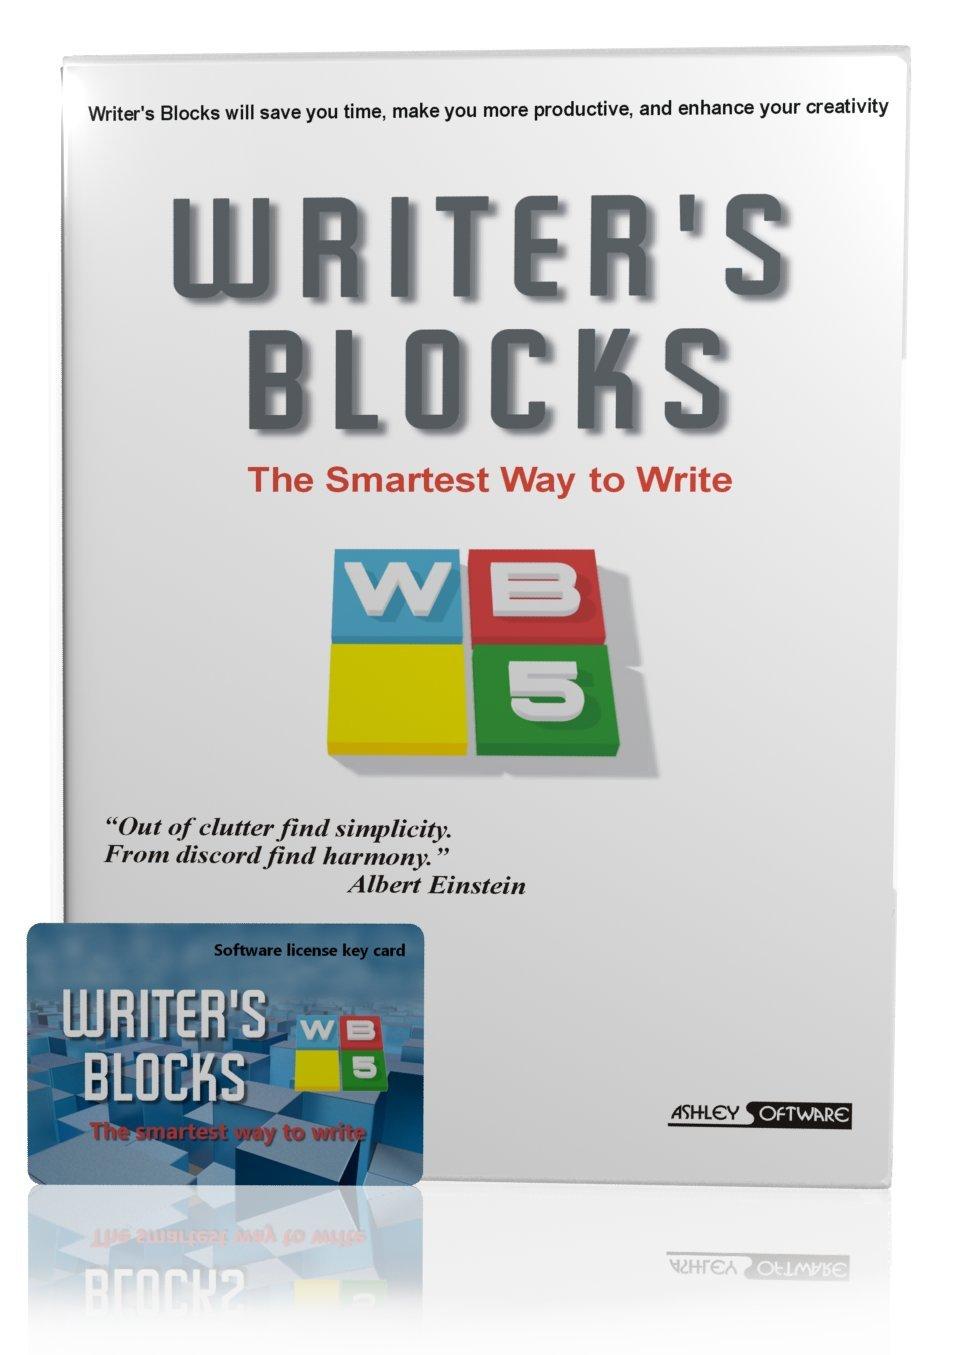 Writer's Blocks by Ashley Software